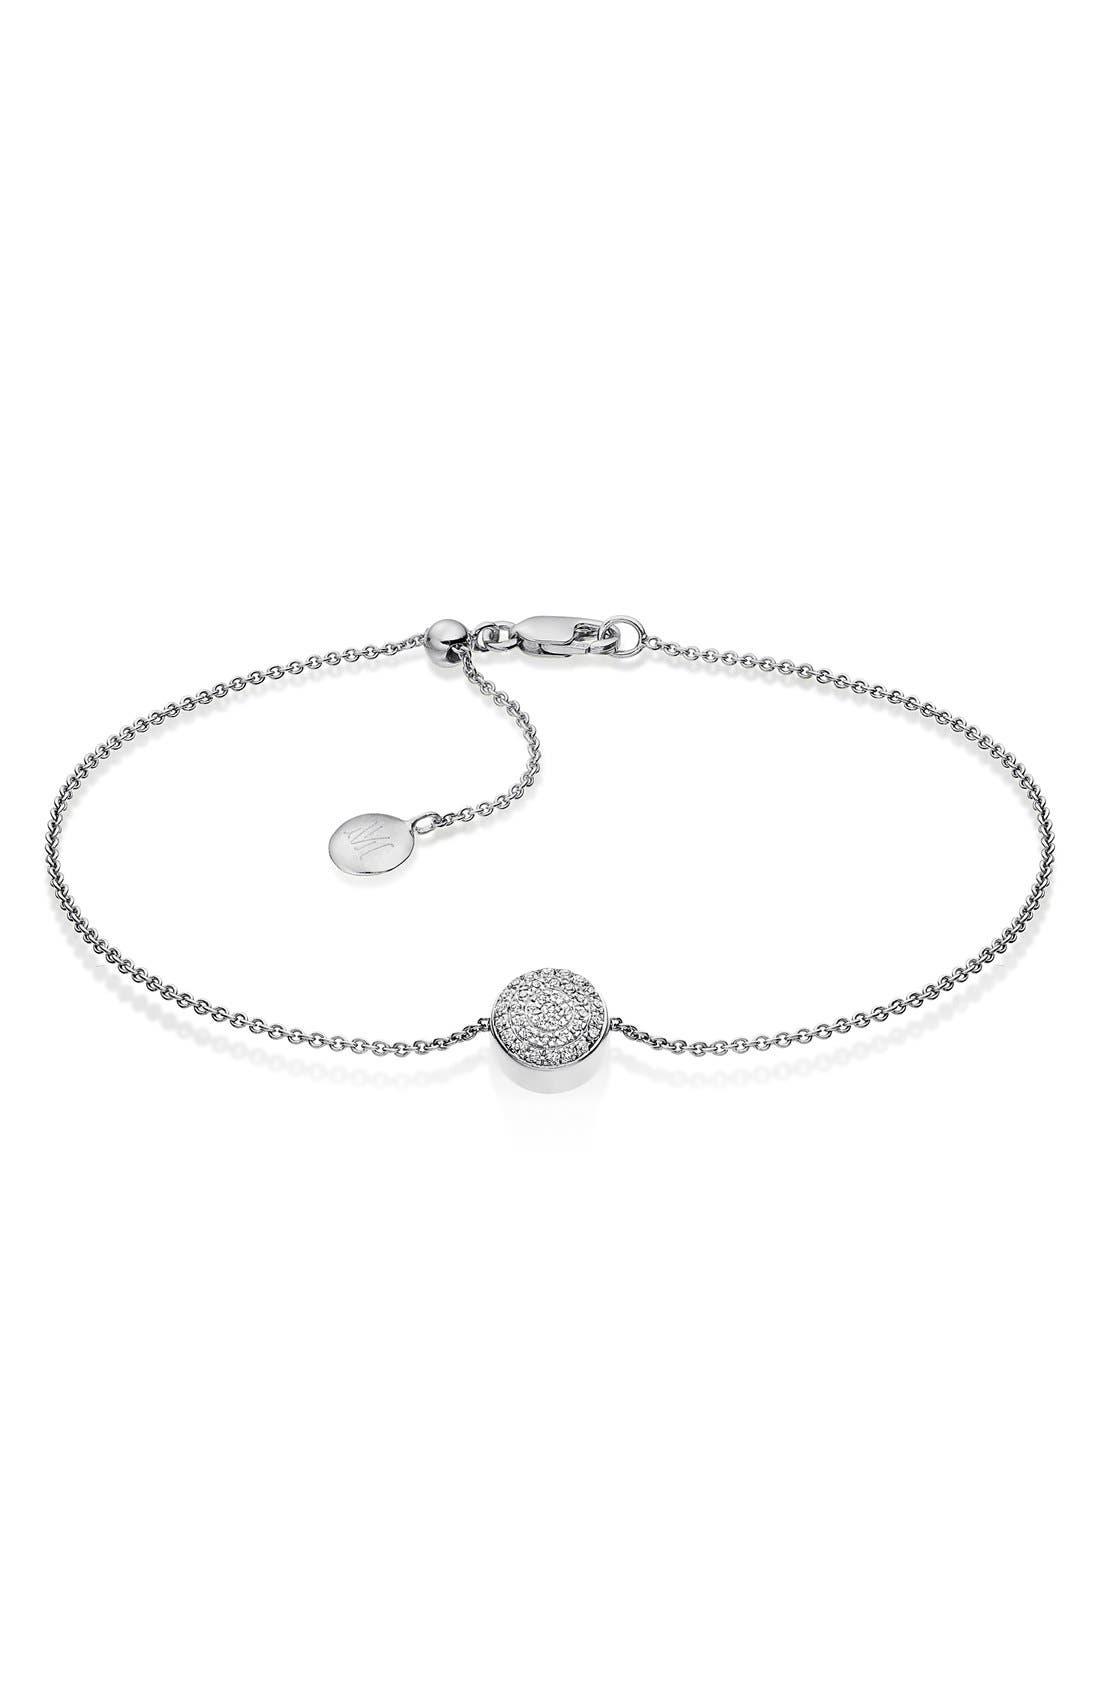 Main Image - Monica Vinader 'Ava' Diamond Button Bracelet